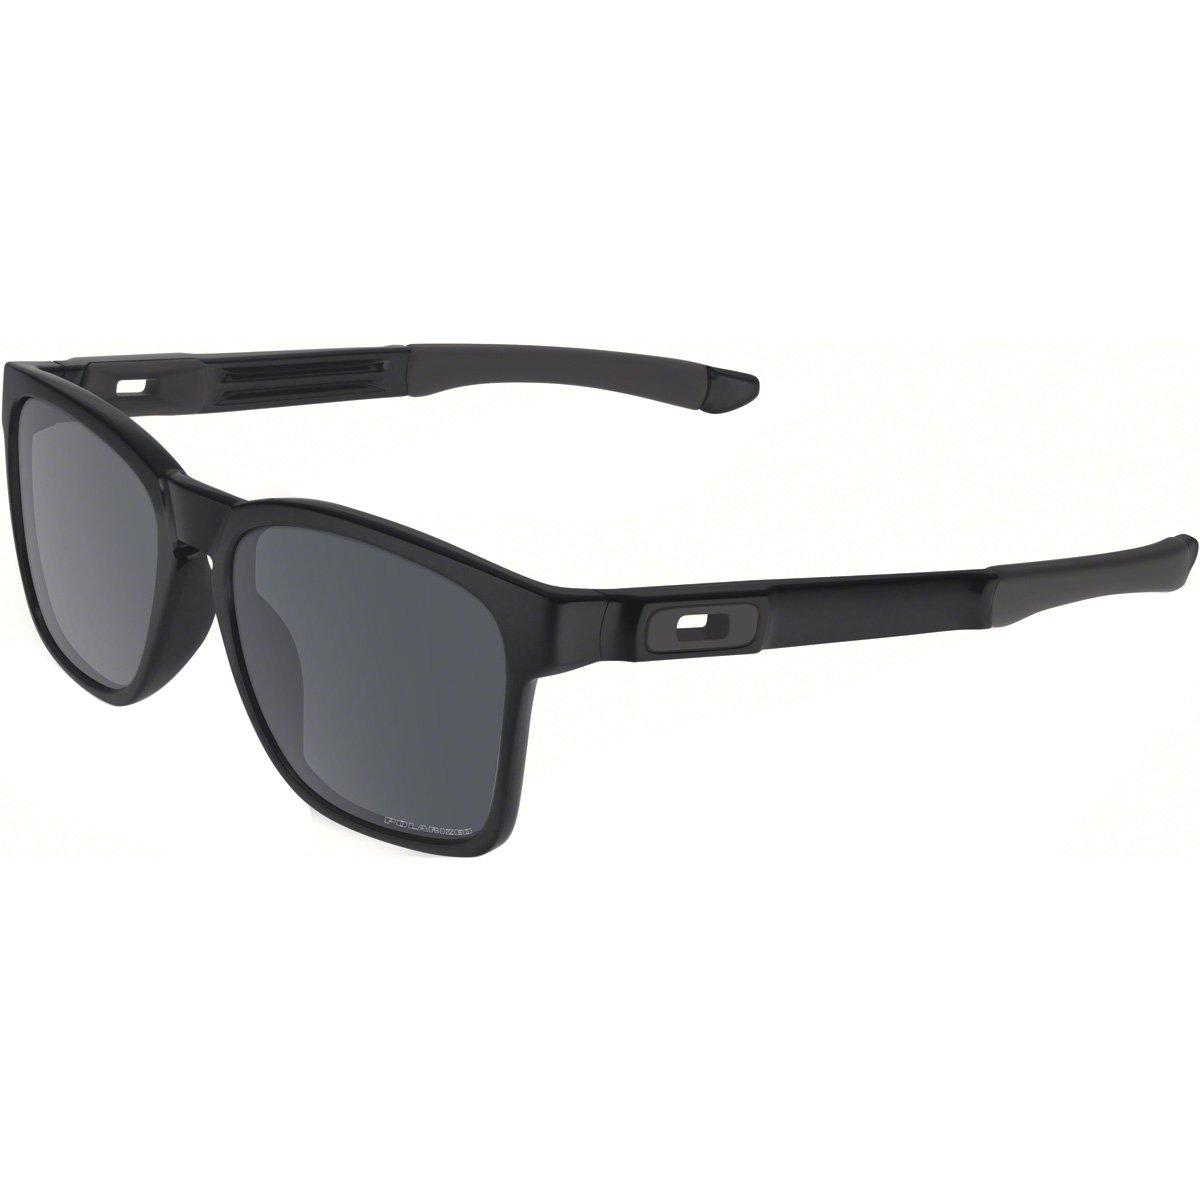 Oakley Men's Catalyst OO9272-09 Polarized Iridium Square Sunglasses, Matte Black, 55 mm